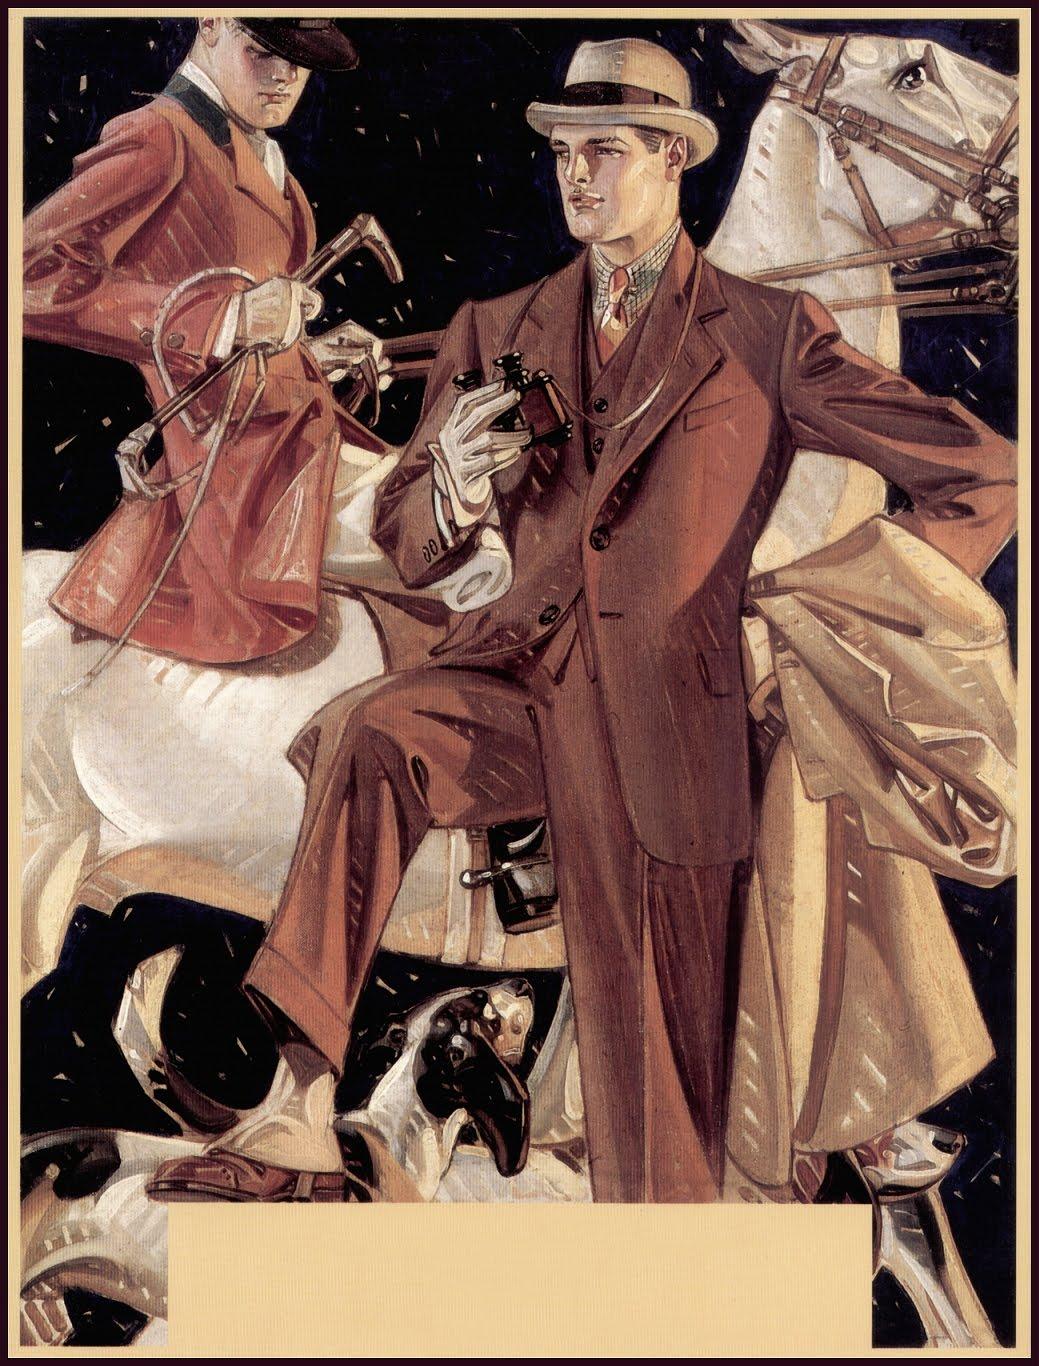 Flooby Nooby: The Art of J. C. Leyendecker